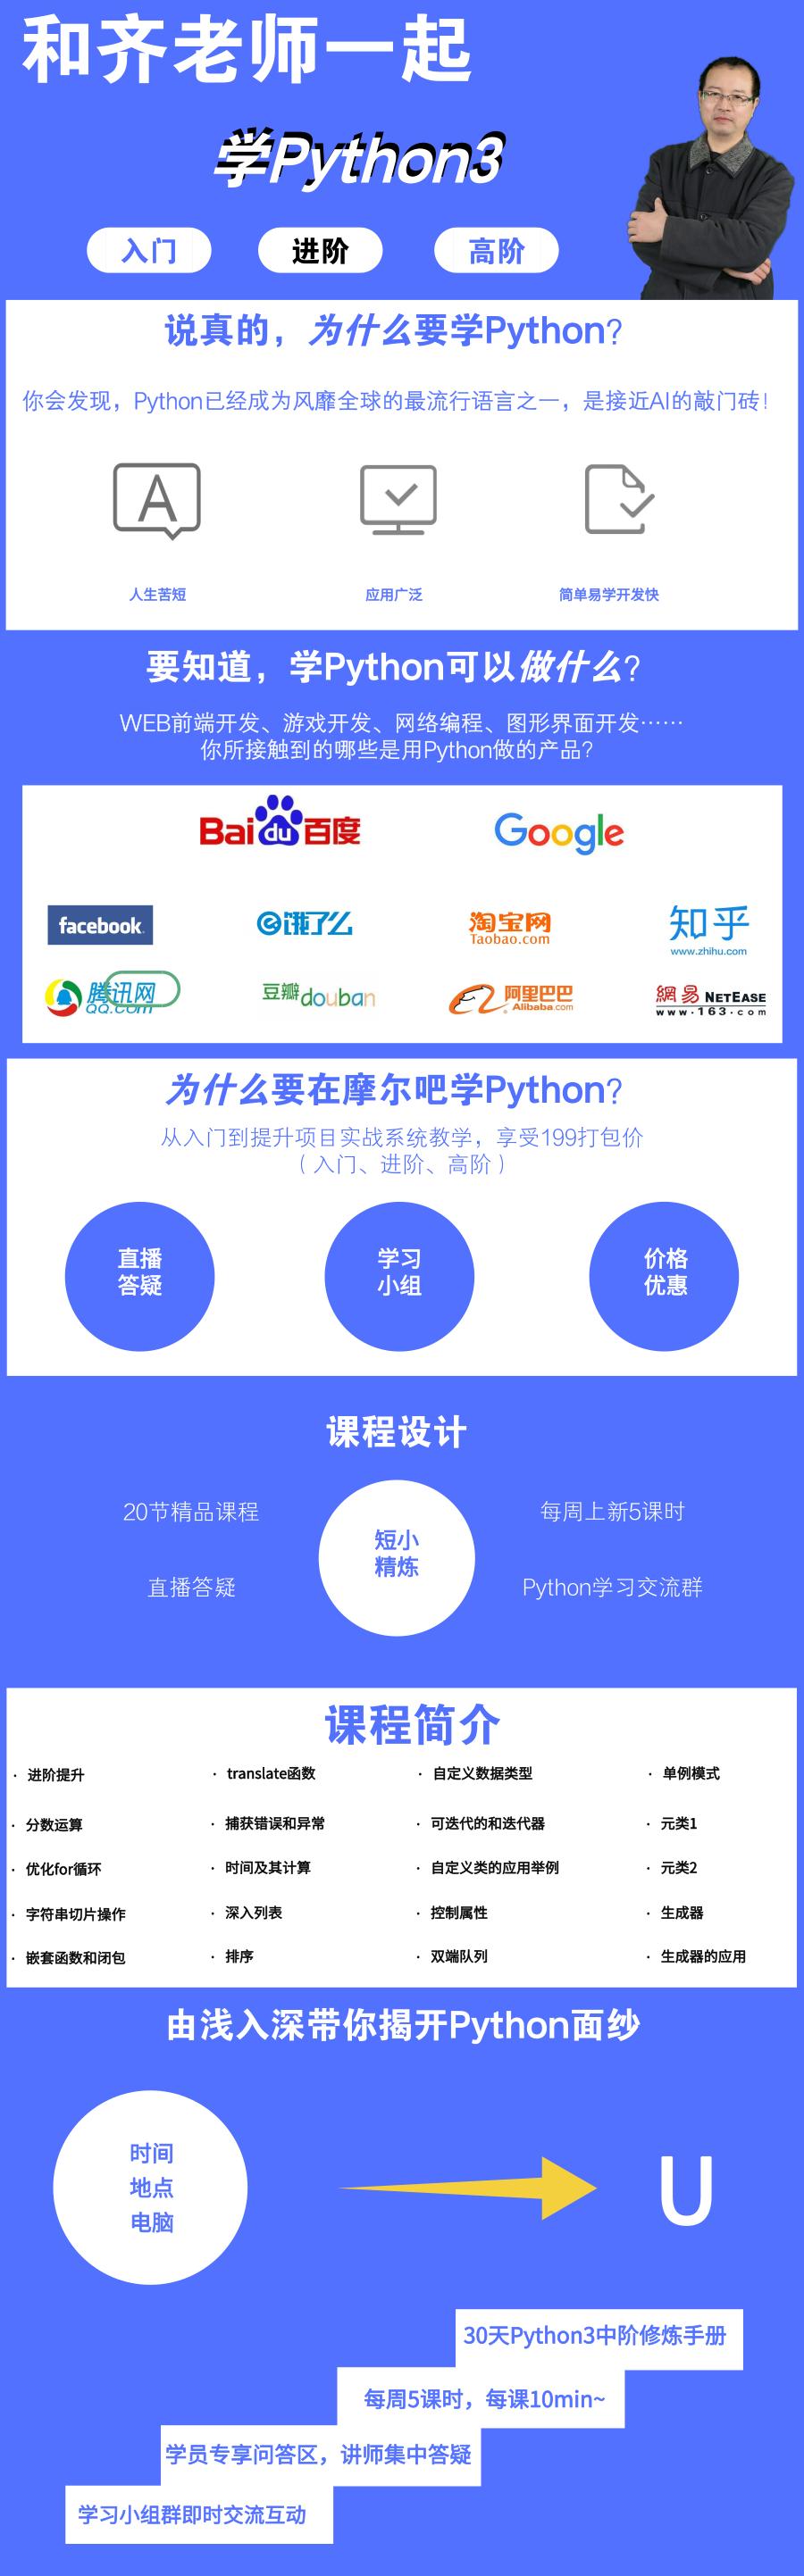 python进阶.png